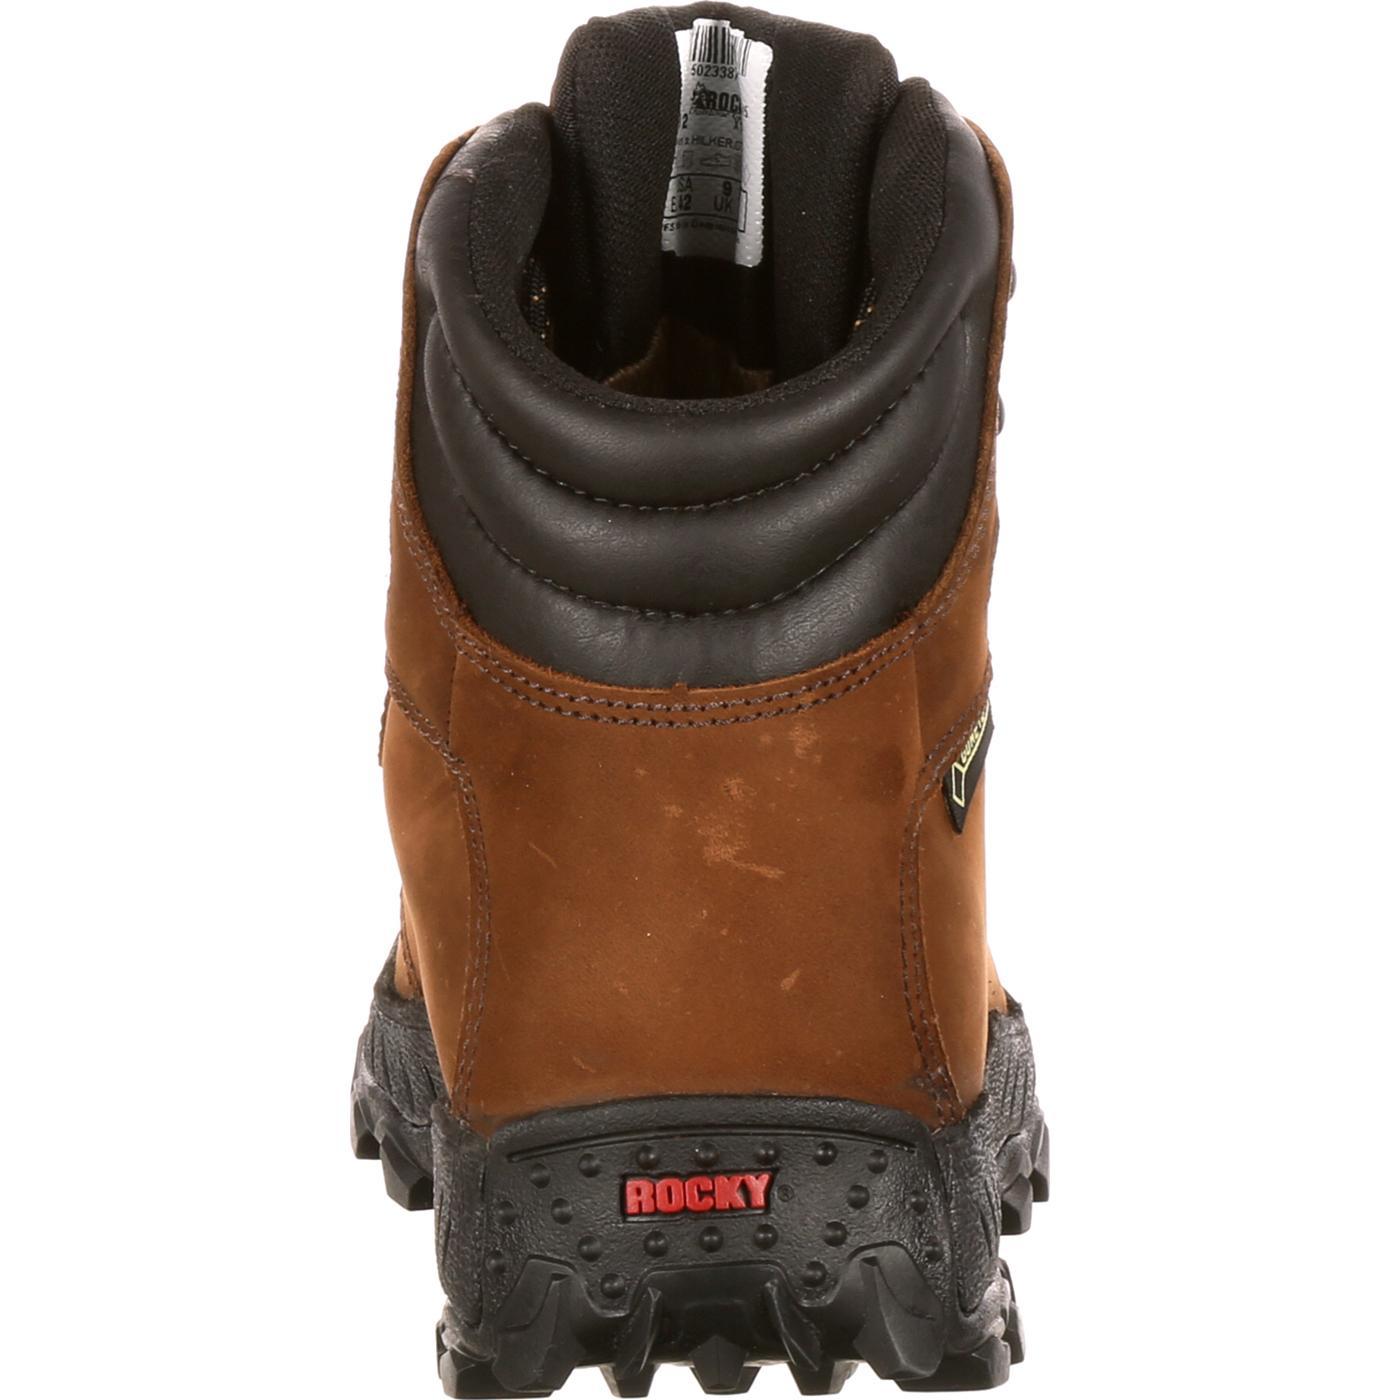 Rocky Creek Bottom GORE-TEX Waterproof Hiker Boot, FQ0005212